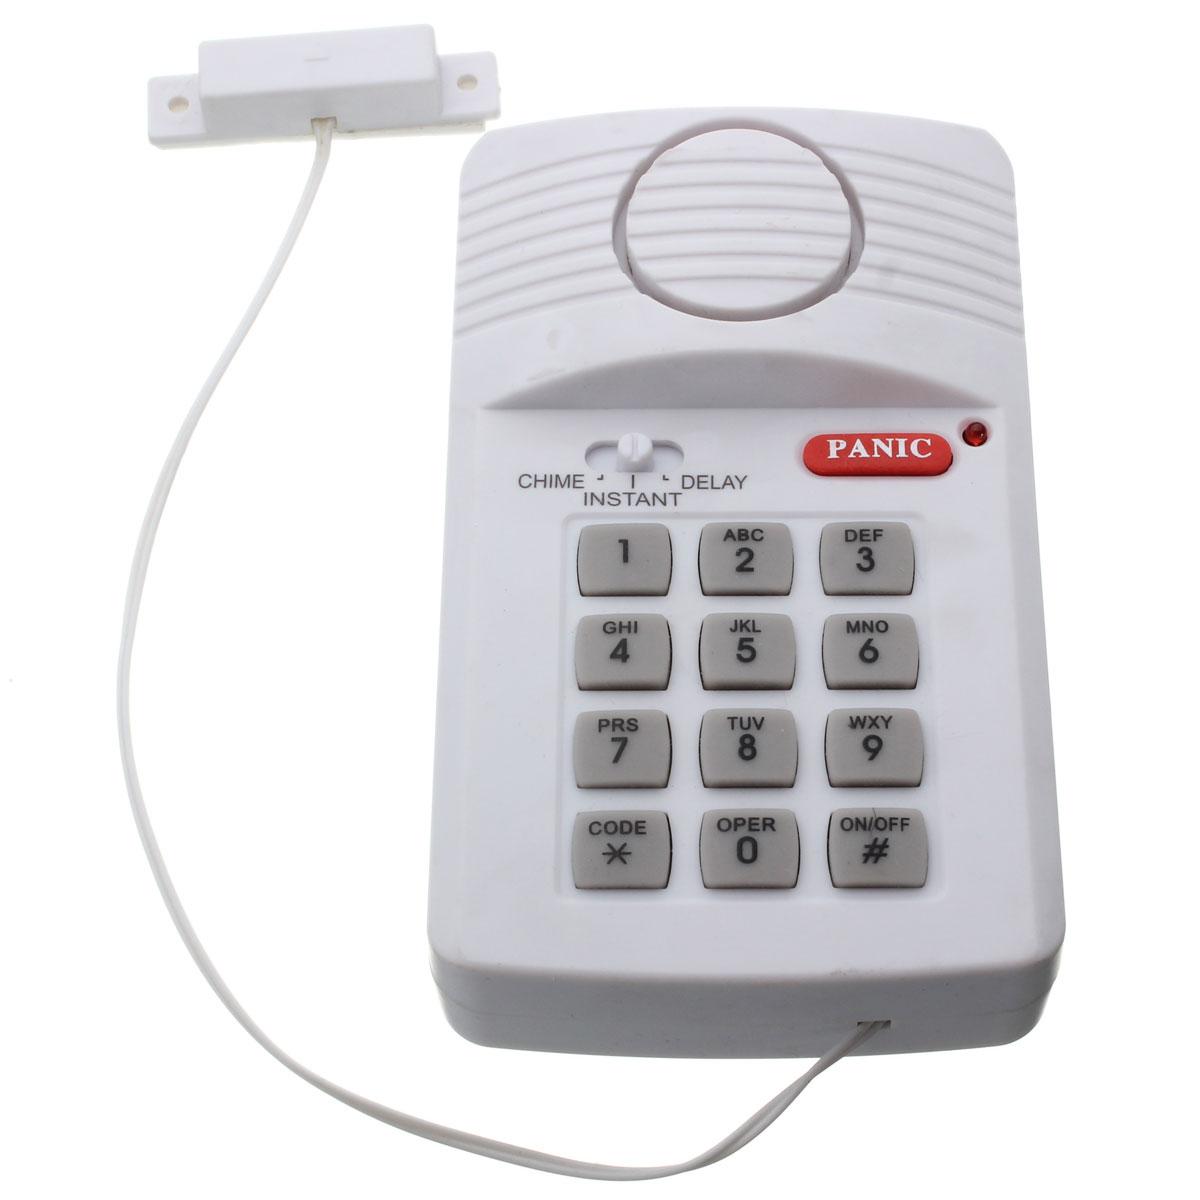 Home Security Keypad Door Alarm Burglar System With Panic Button For Home Shed Garage Caravan